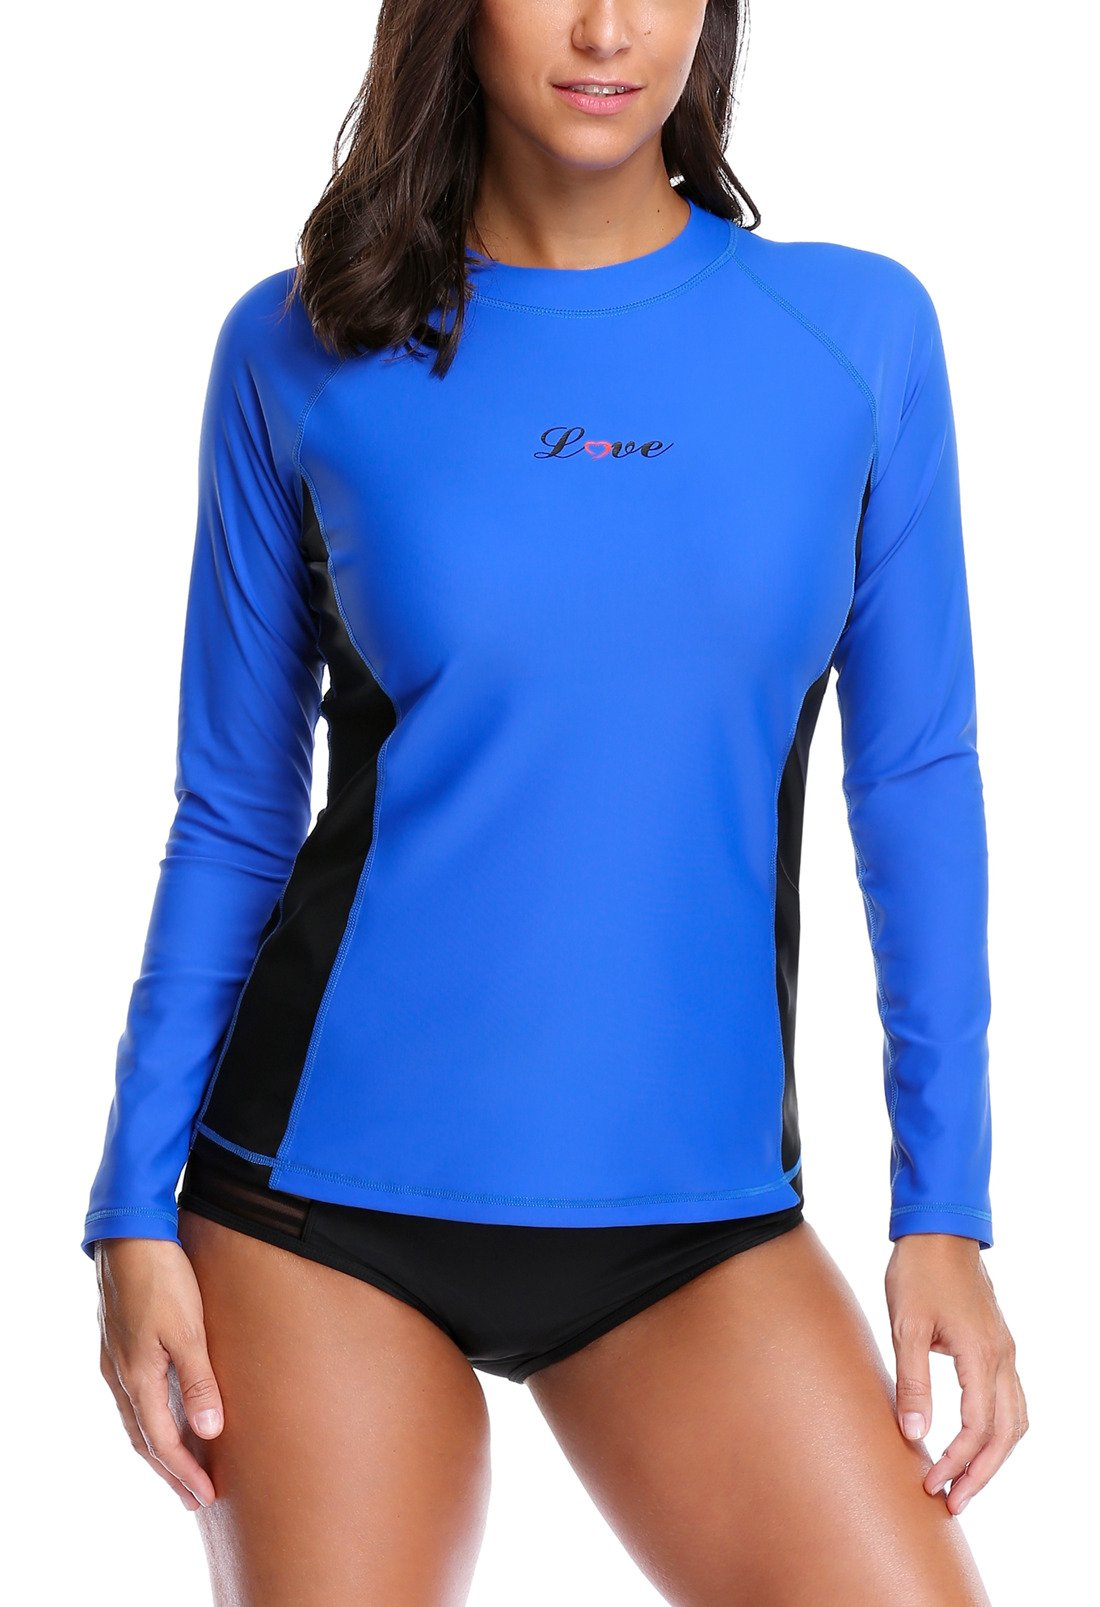 ALove Surf Shirt Rash Guard UPF 50 Athletic Top Womens Surf Rashguard Long Sleeve Medium by ALove (Image #1)